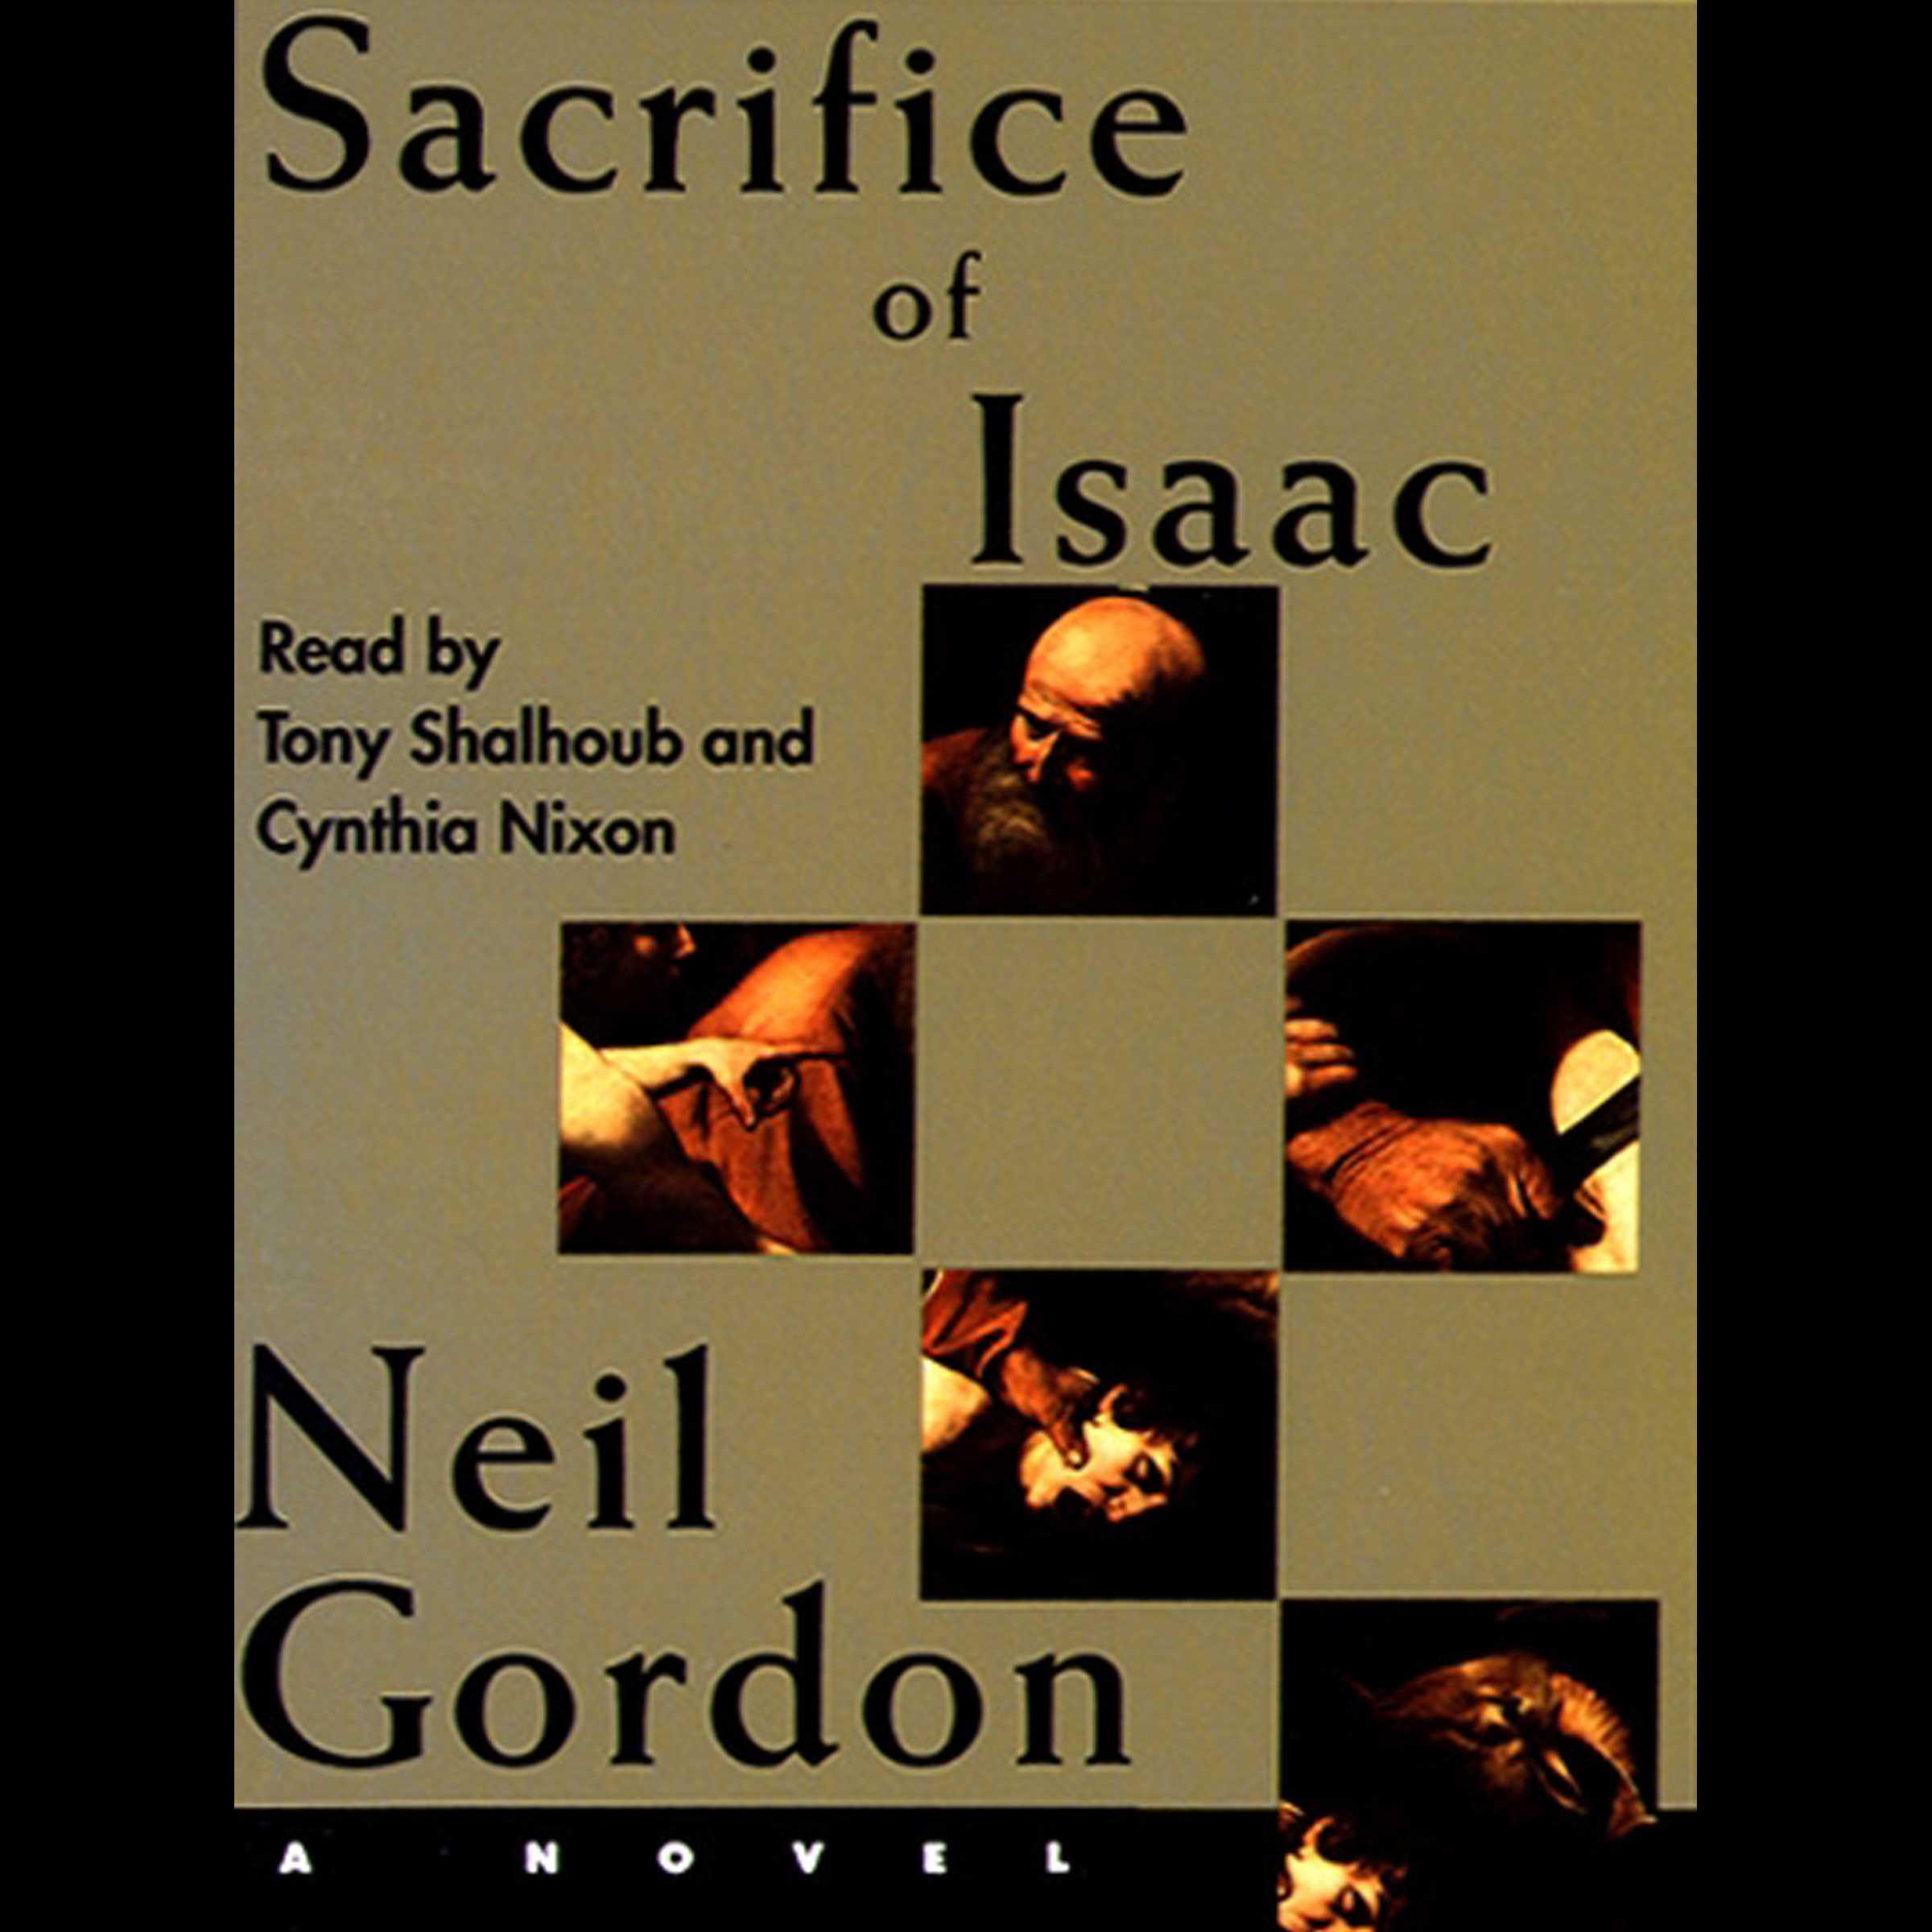 Sacrifice of isaac 9780743540513 hr